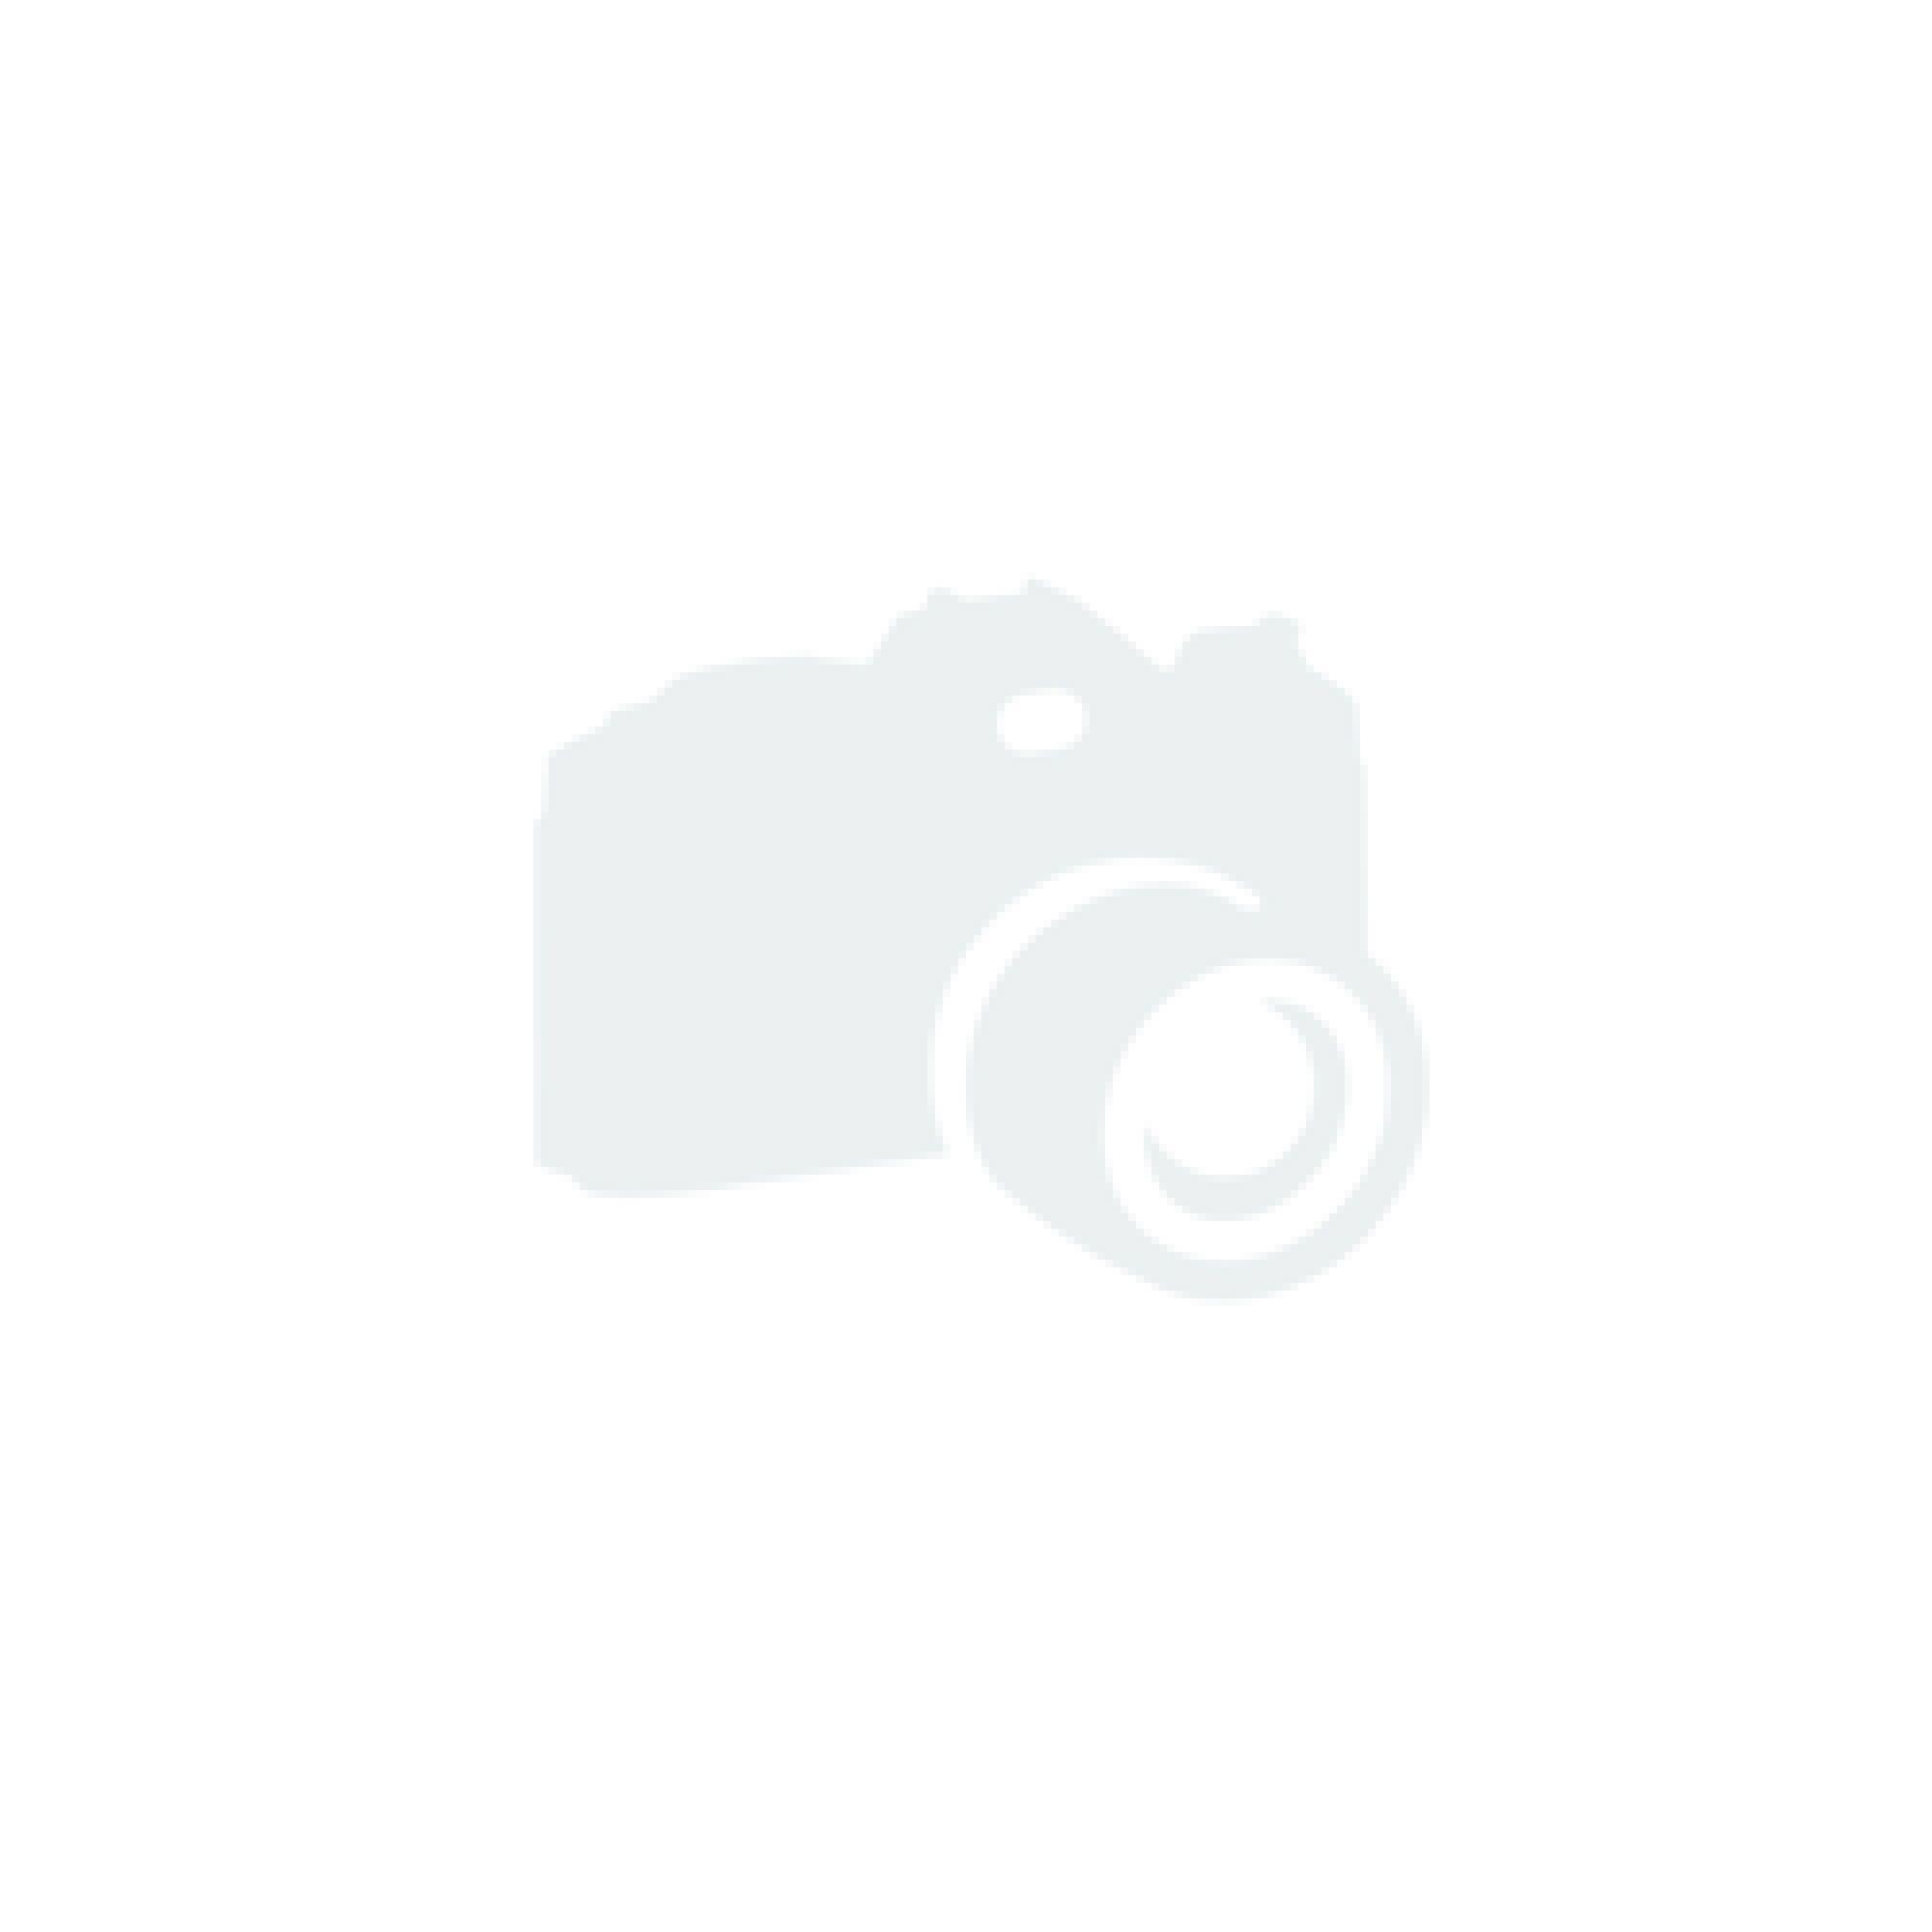 kitsound manhattan bluetooth over ear headphones with mic black rose gold ebay. Black Bedroom Furniture Sets. Home Design Ideas